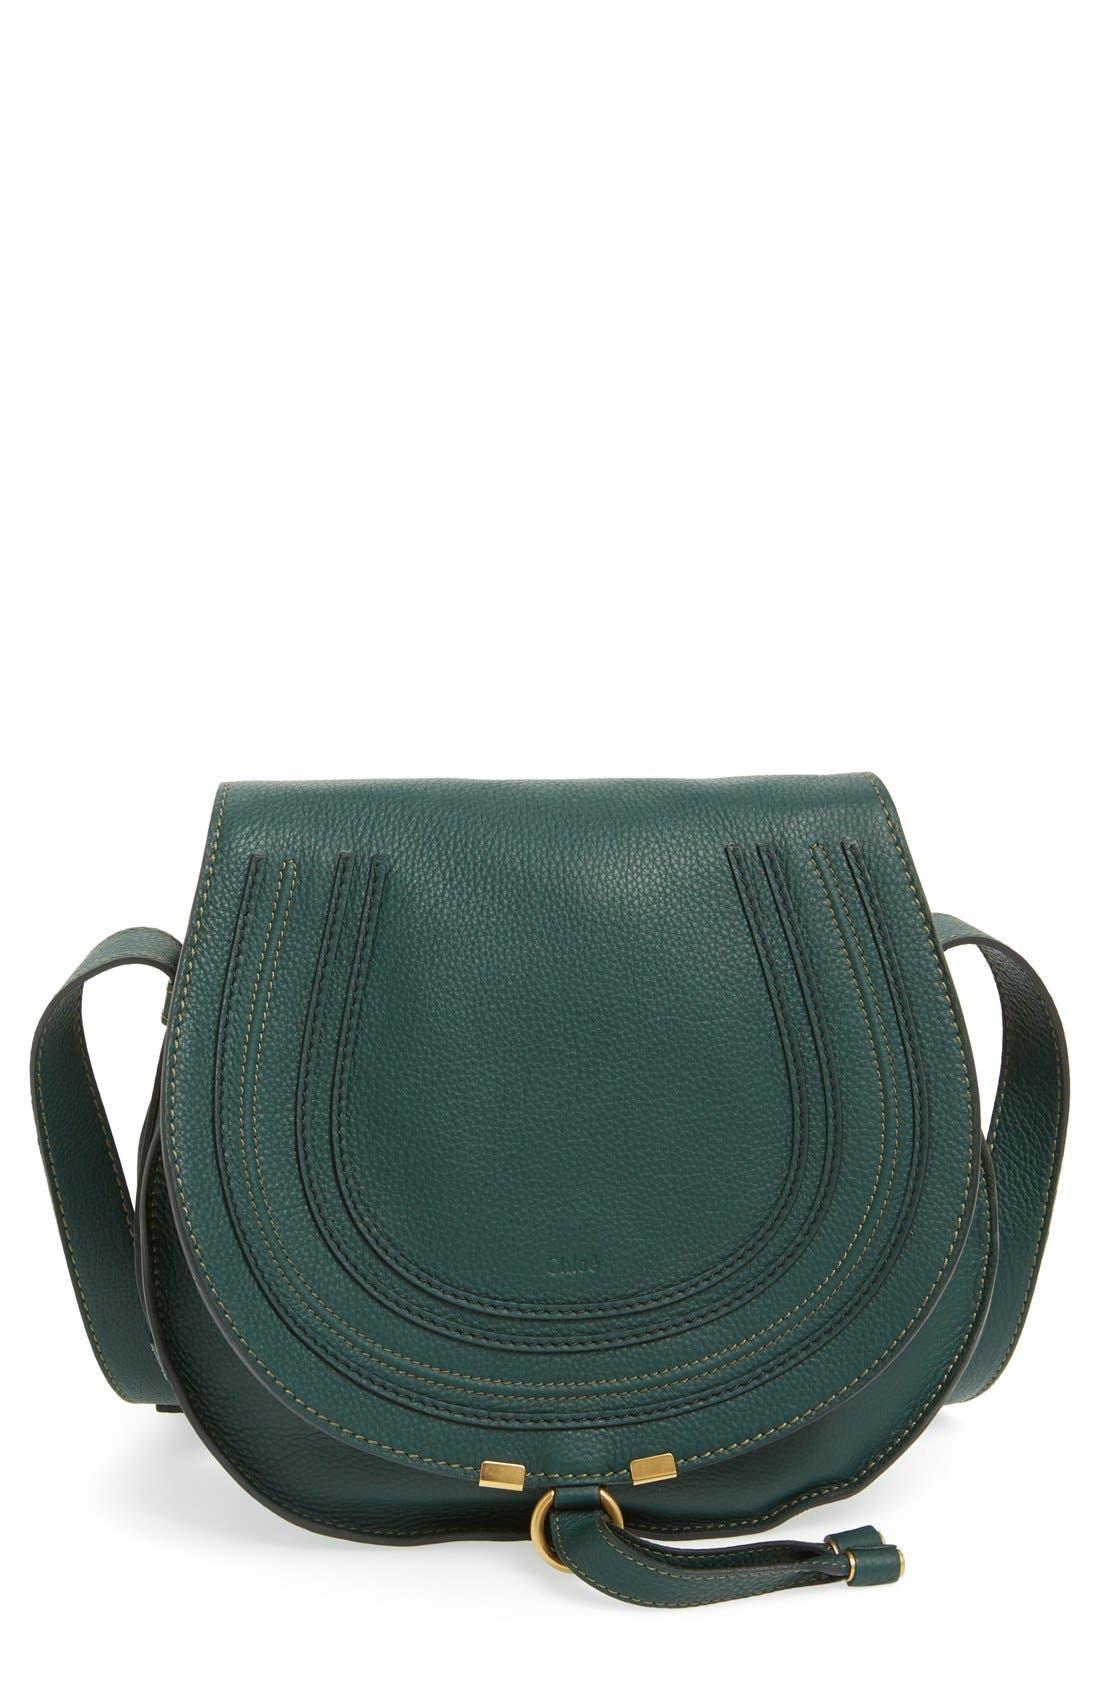 Main Image - Chloé 'Marcie - Medium' Leather Crossbody Bag